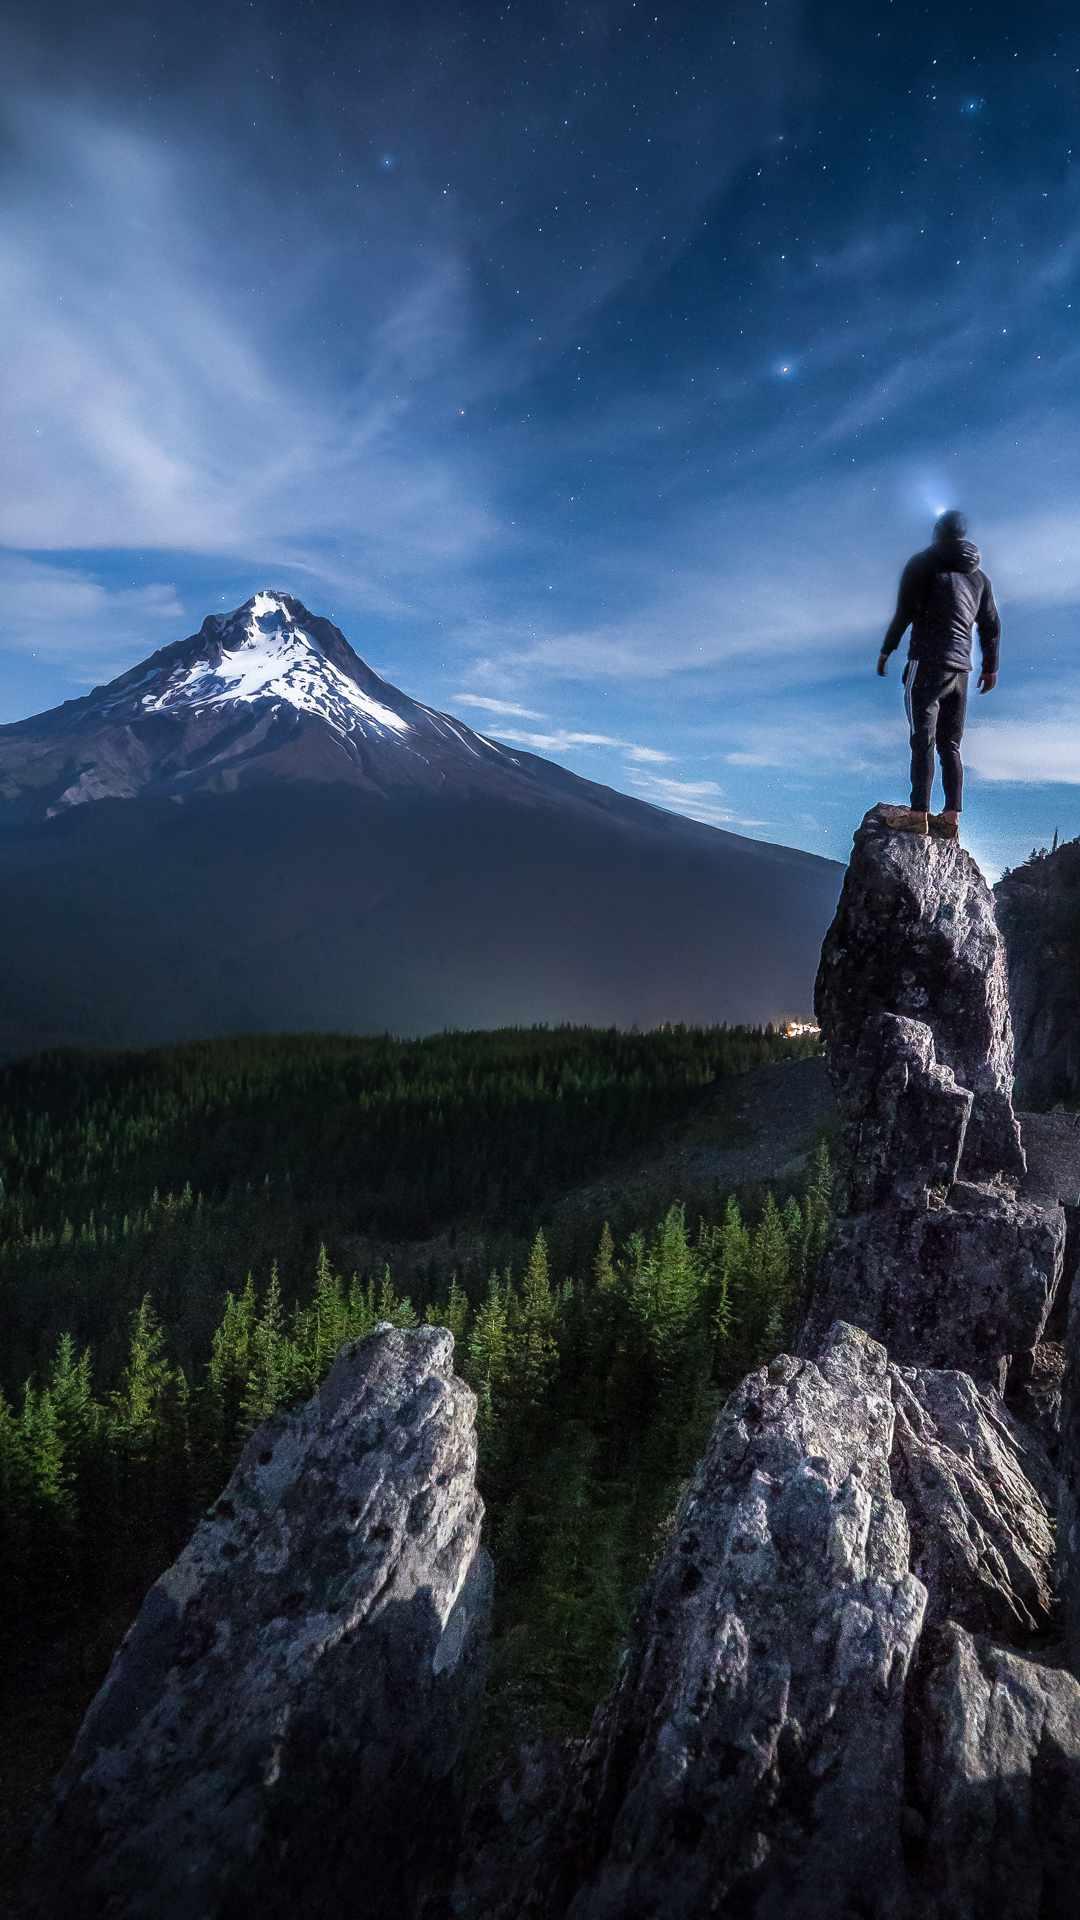 Adventure at Mountain iPhone Wallpaper